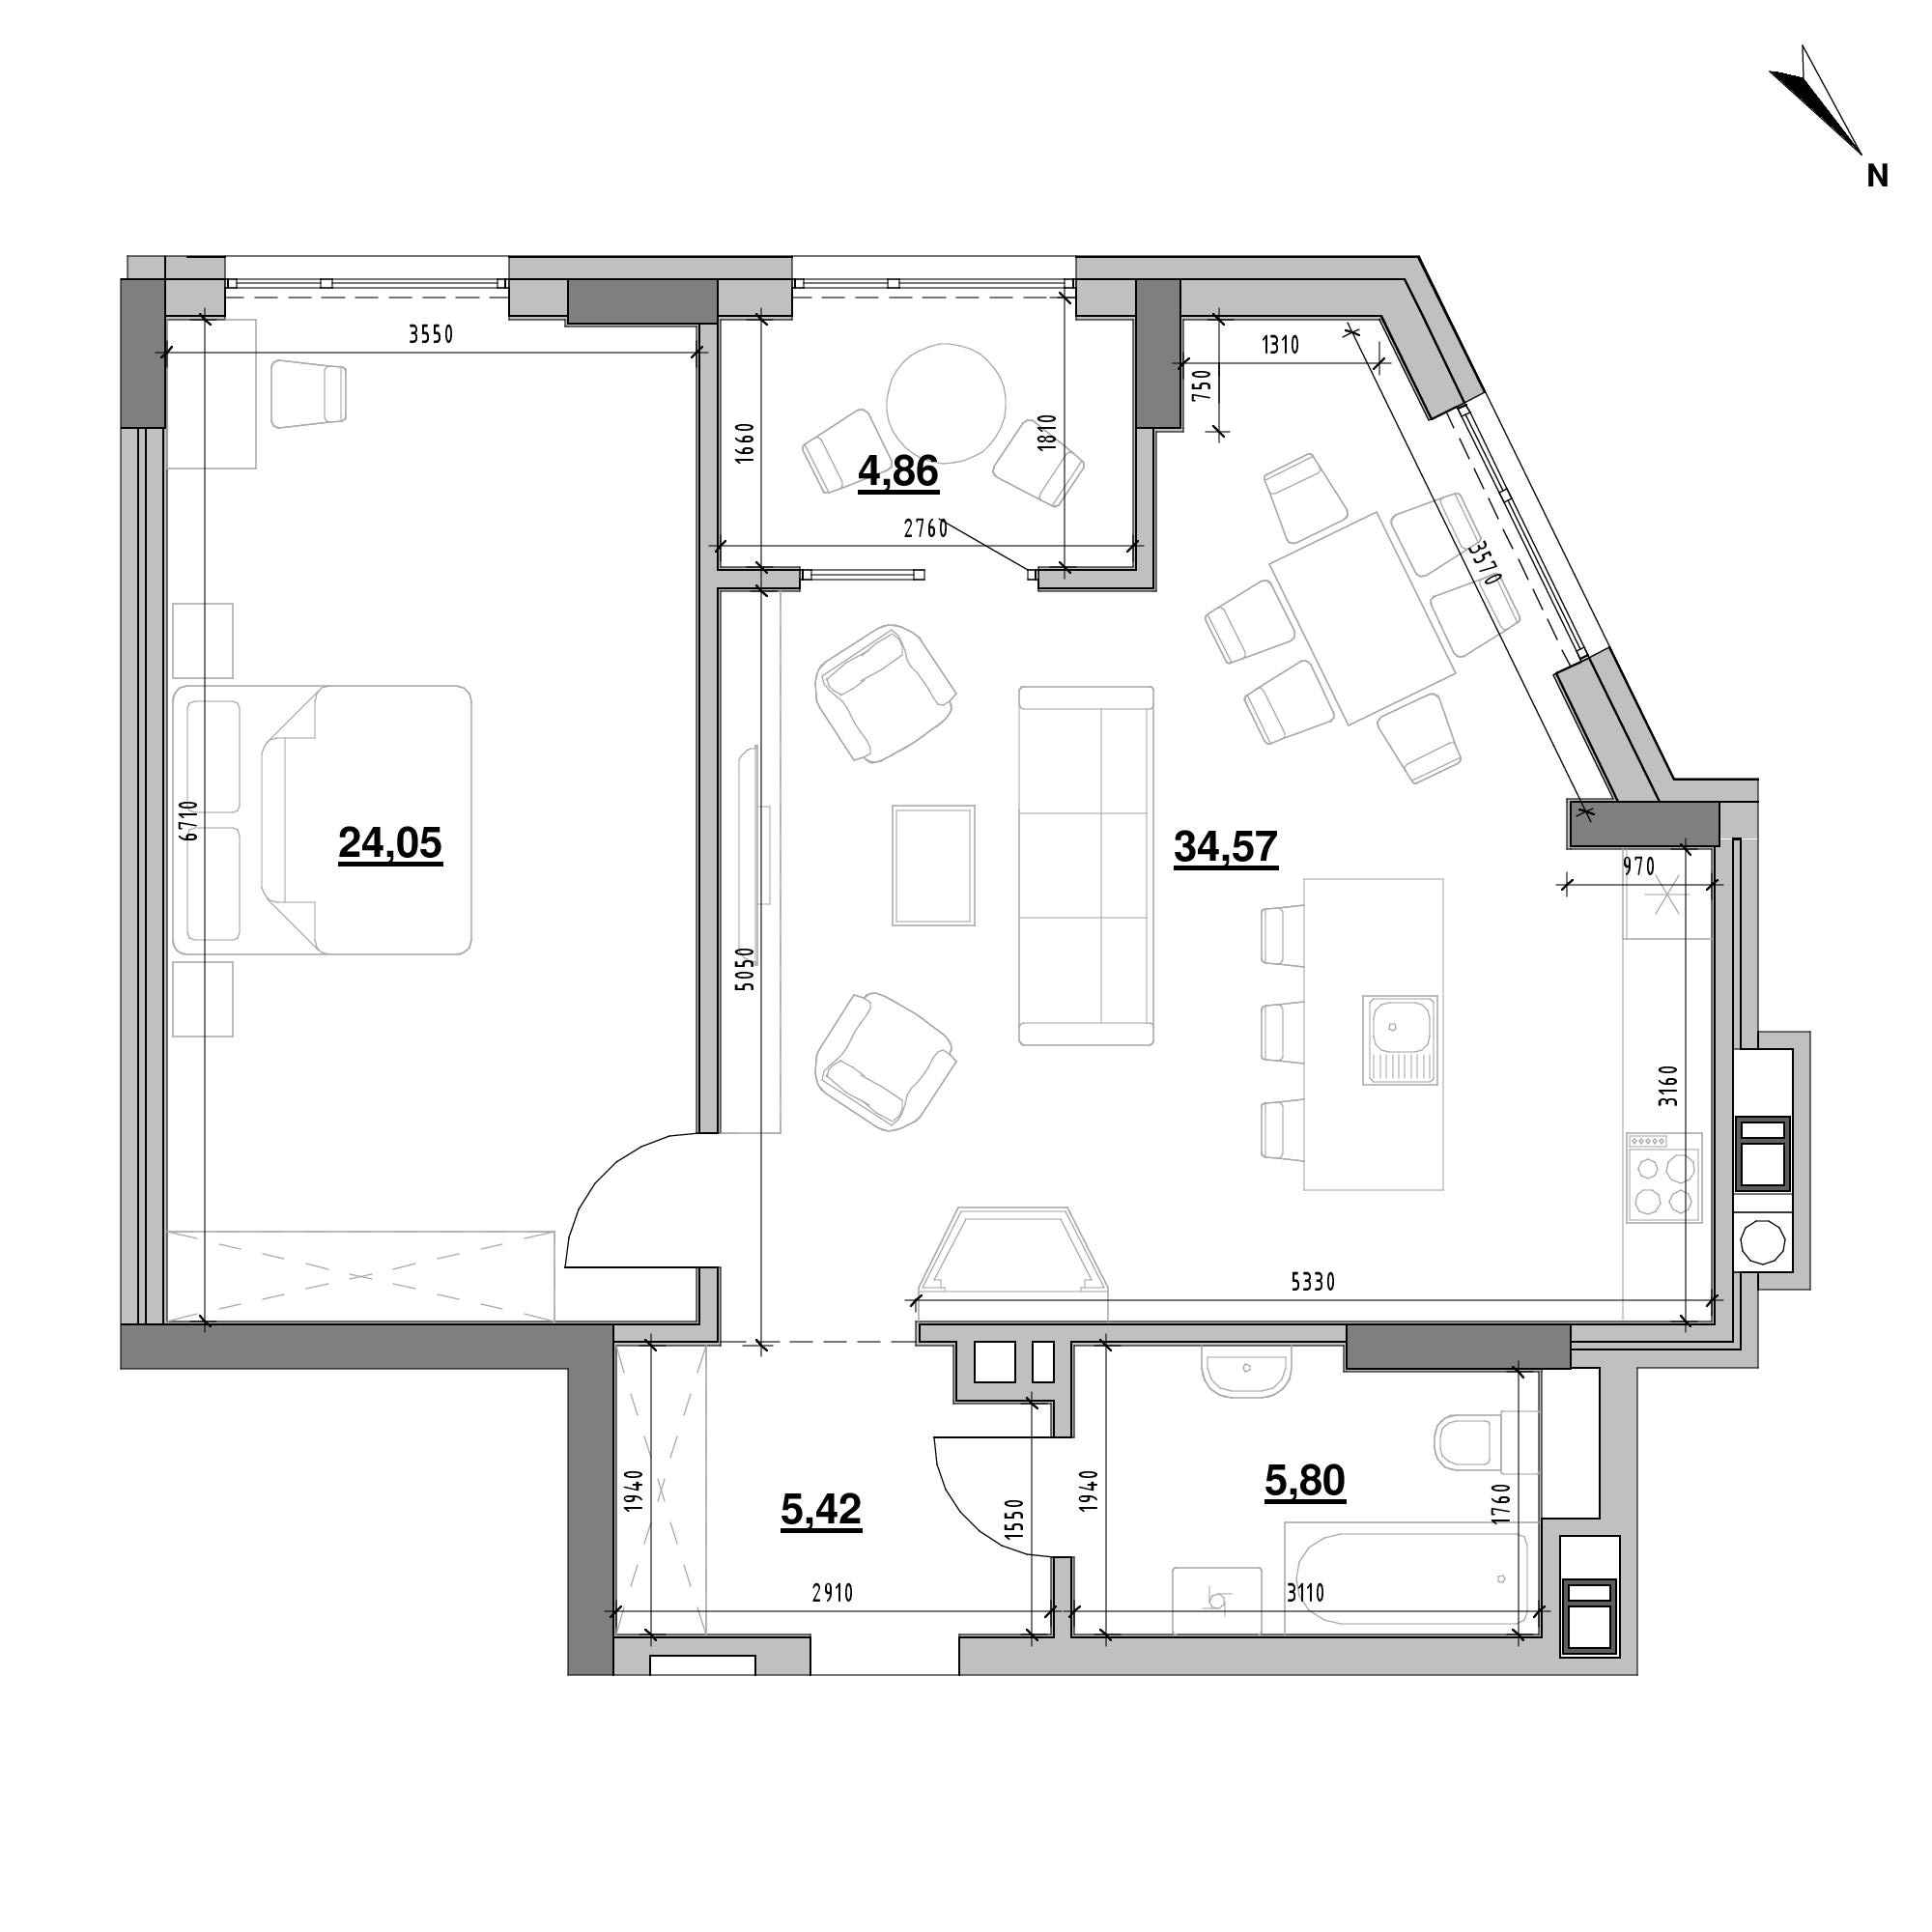 ЖК Ярославенка: планування 1-кімнатної квартири, №21, 74.7 м<sup>2</sup>